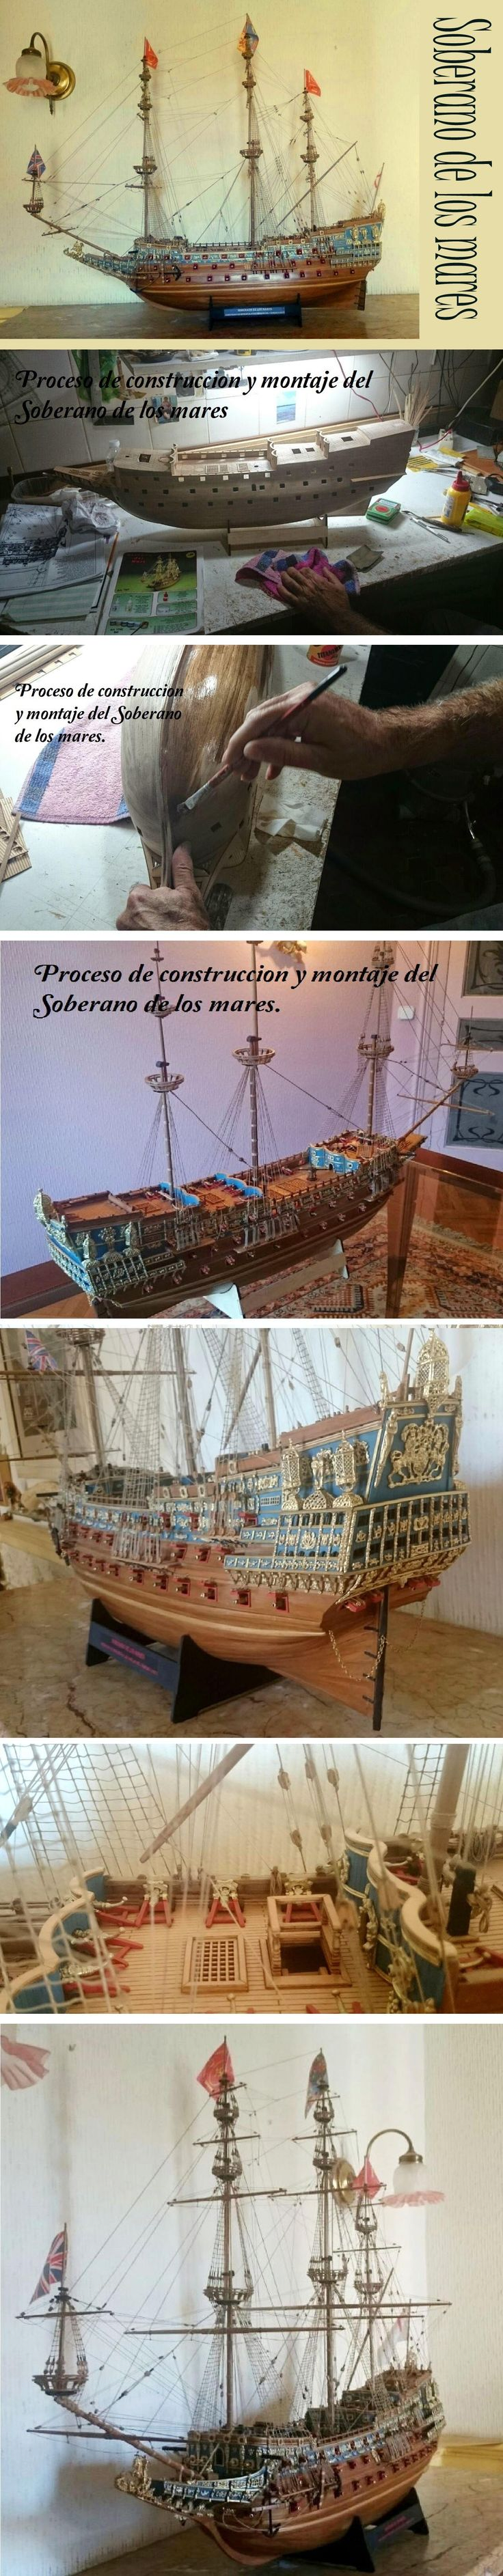 "Maqueta Barco ""El soberano de los mares"". 1:78.Mantua Model MM787 2014-2015 (Sovereign of the Seas).  MARCA Y MODELO: Mantua Model  Modelo MM787 (Italia). Novedad 2014-2015. Modelo solo para expertos. Réplica del famoso Sovereign of the Seas, ""Soberano de los Mares"". Kit de madera cortada a láser. 102 cañones.  ESCALA: 1:78 KIT DE MONTAJE MANTUA MODEL. ESLORA: 1.120 mm. ALTURA: 750 mm (950 mm alto con peana). ANCHO: 450 mm."